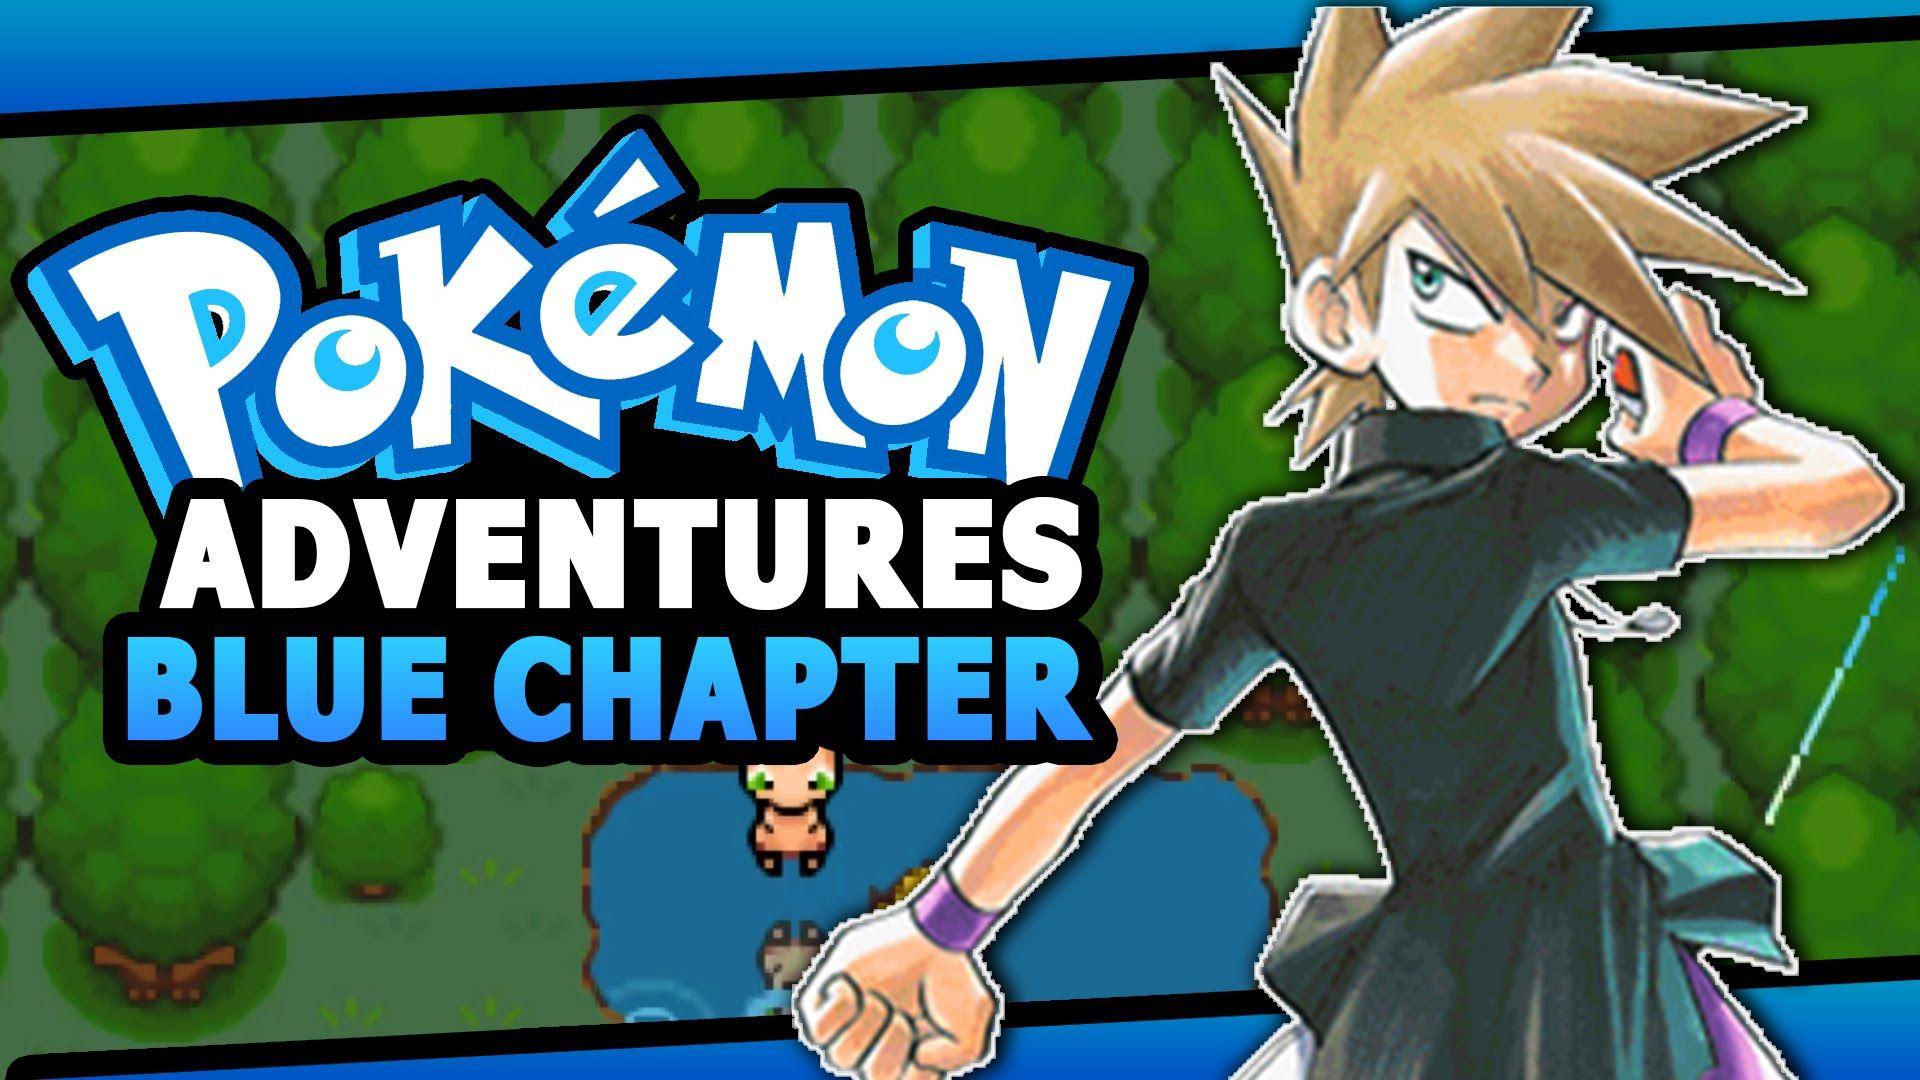 Pokemon Adventures Blue Chapter Pokemon Gba Rom Hack Pokemon Omega